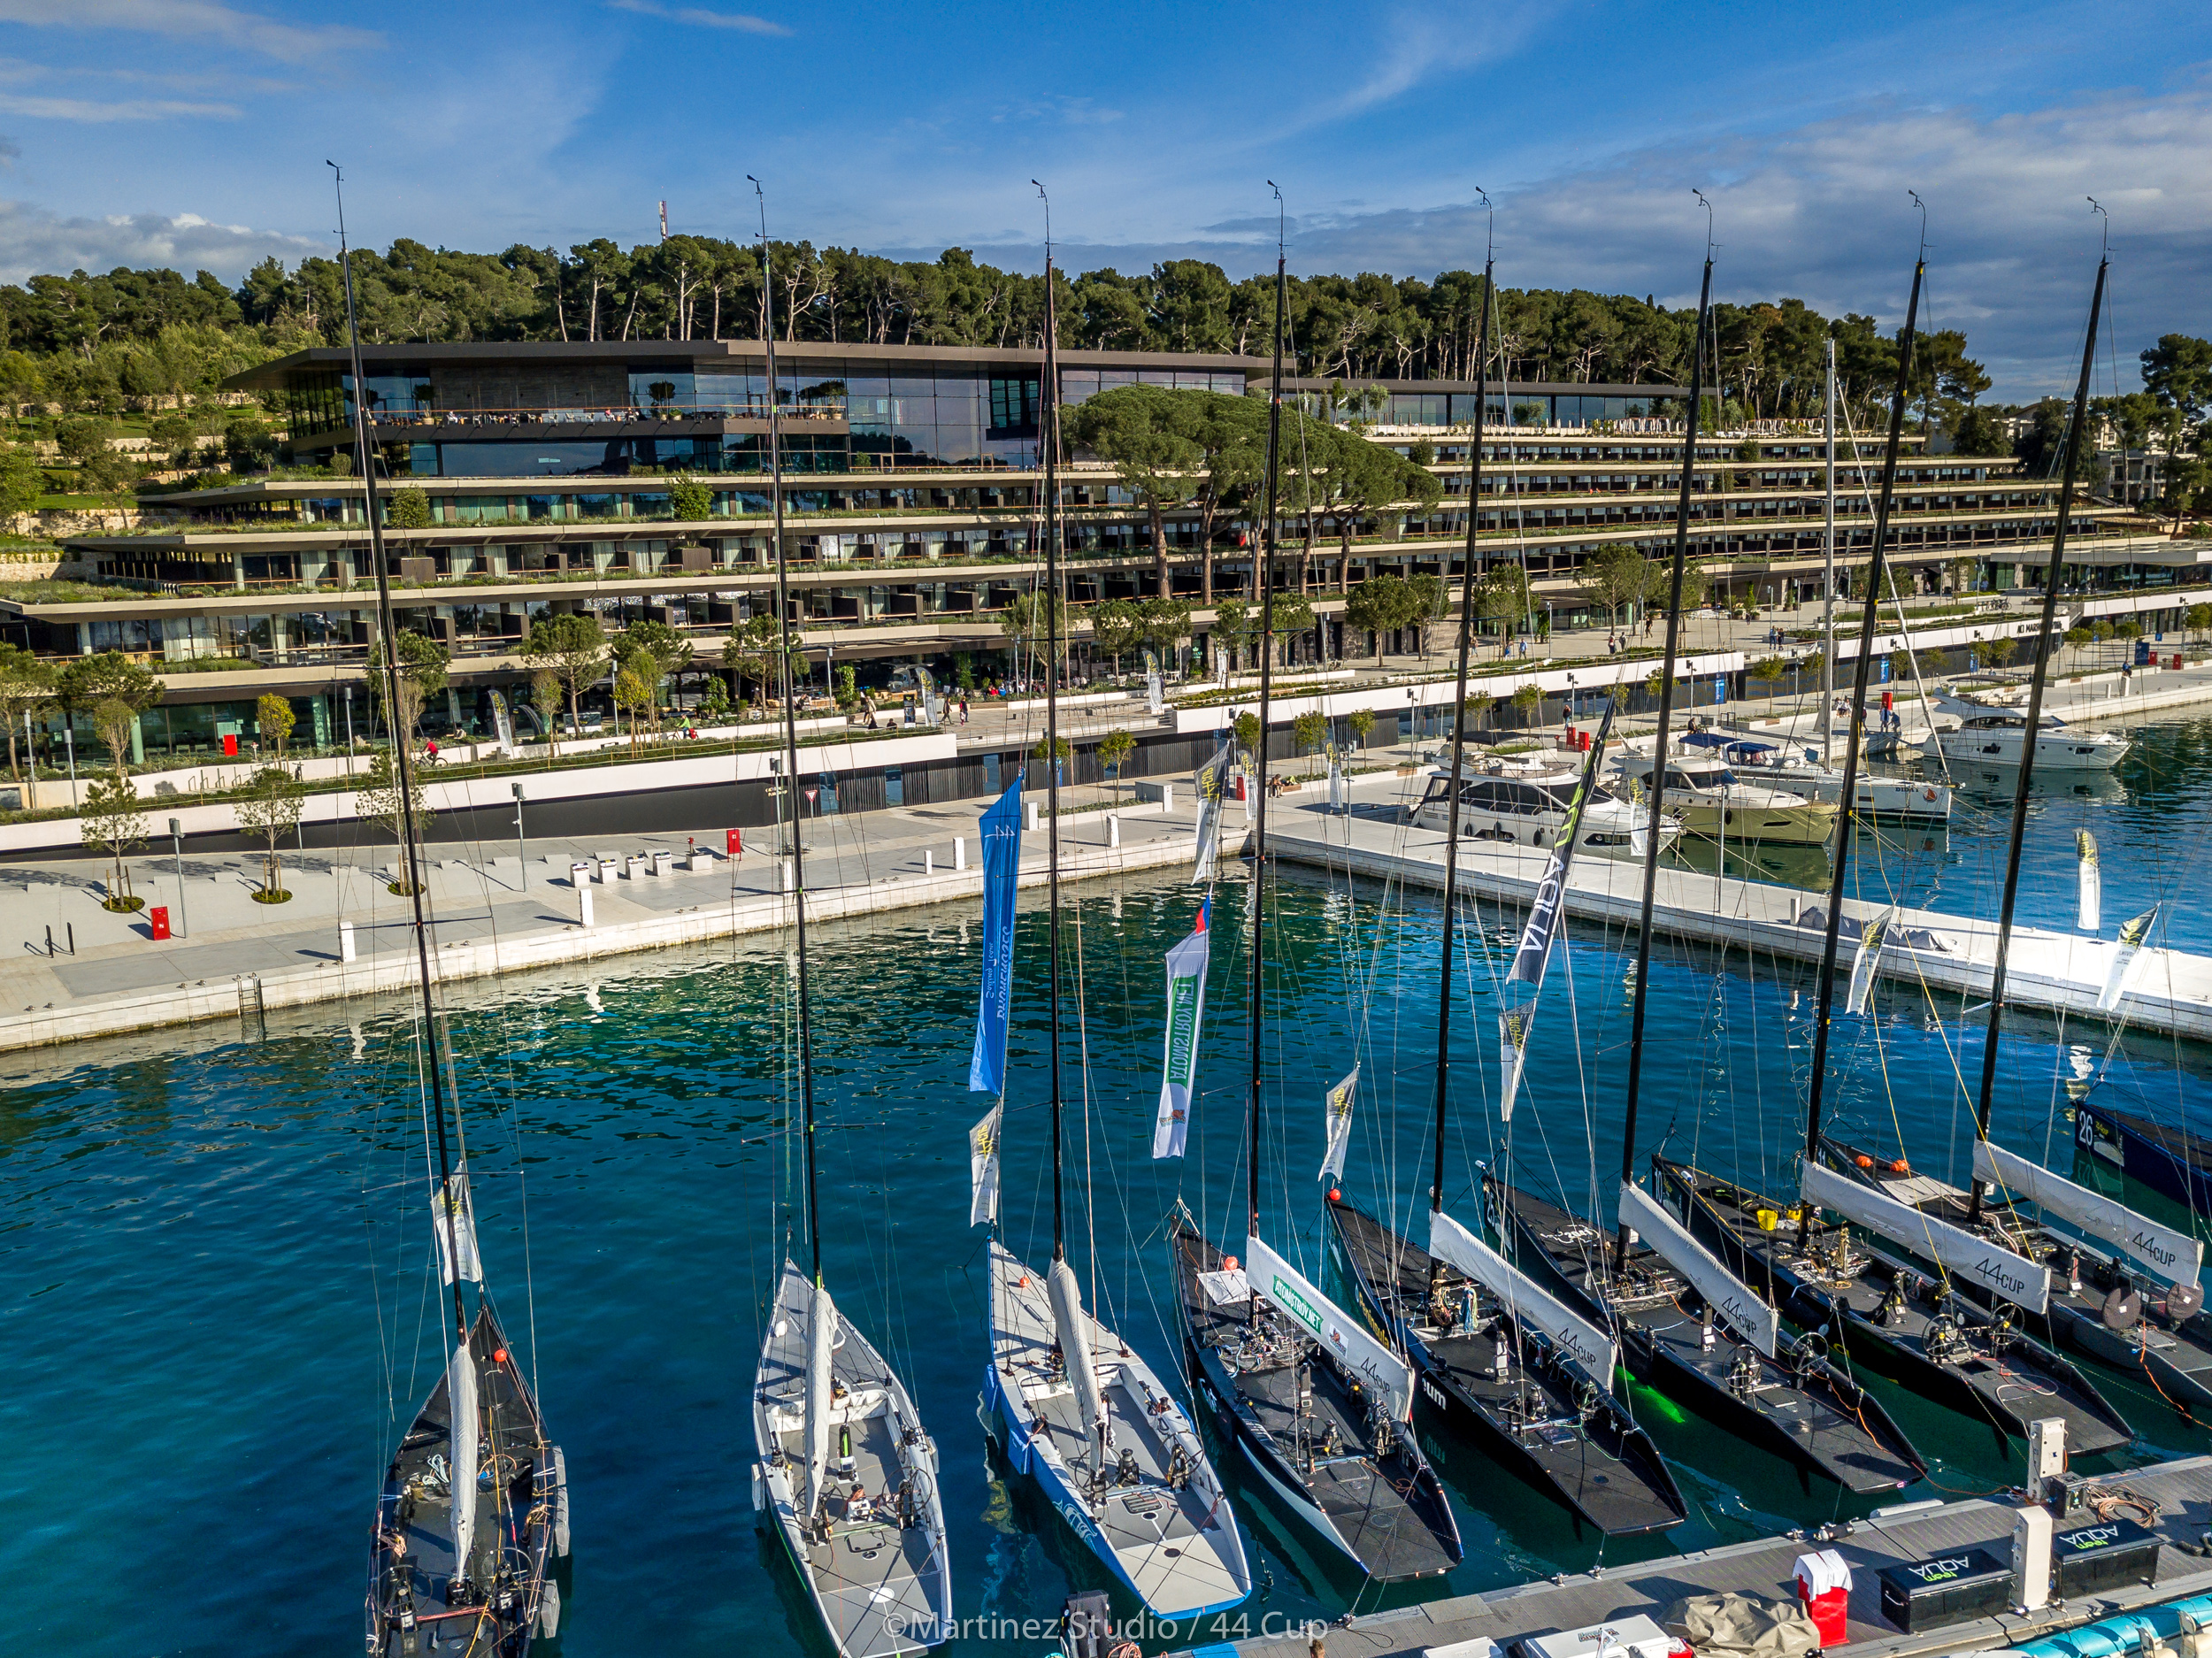 Maistra_sailboats